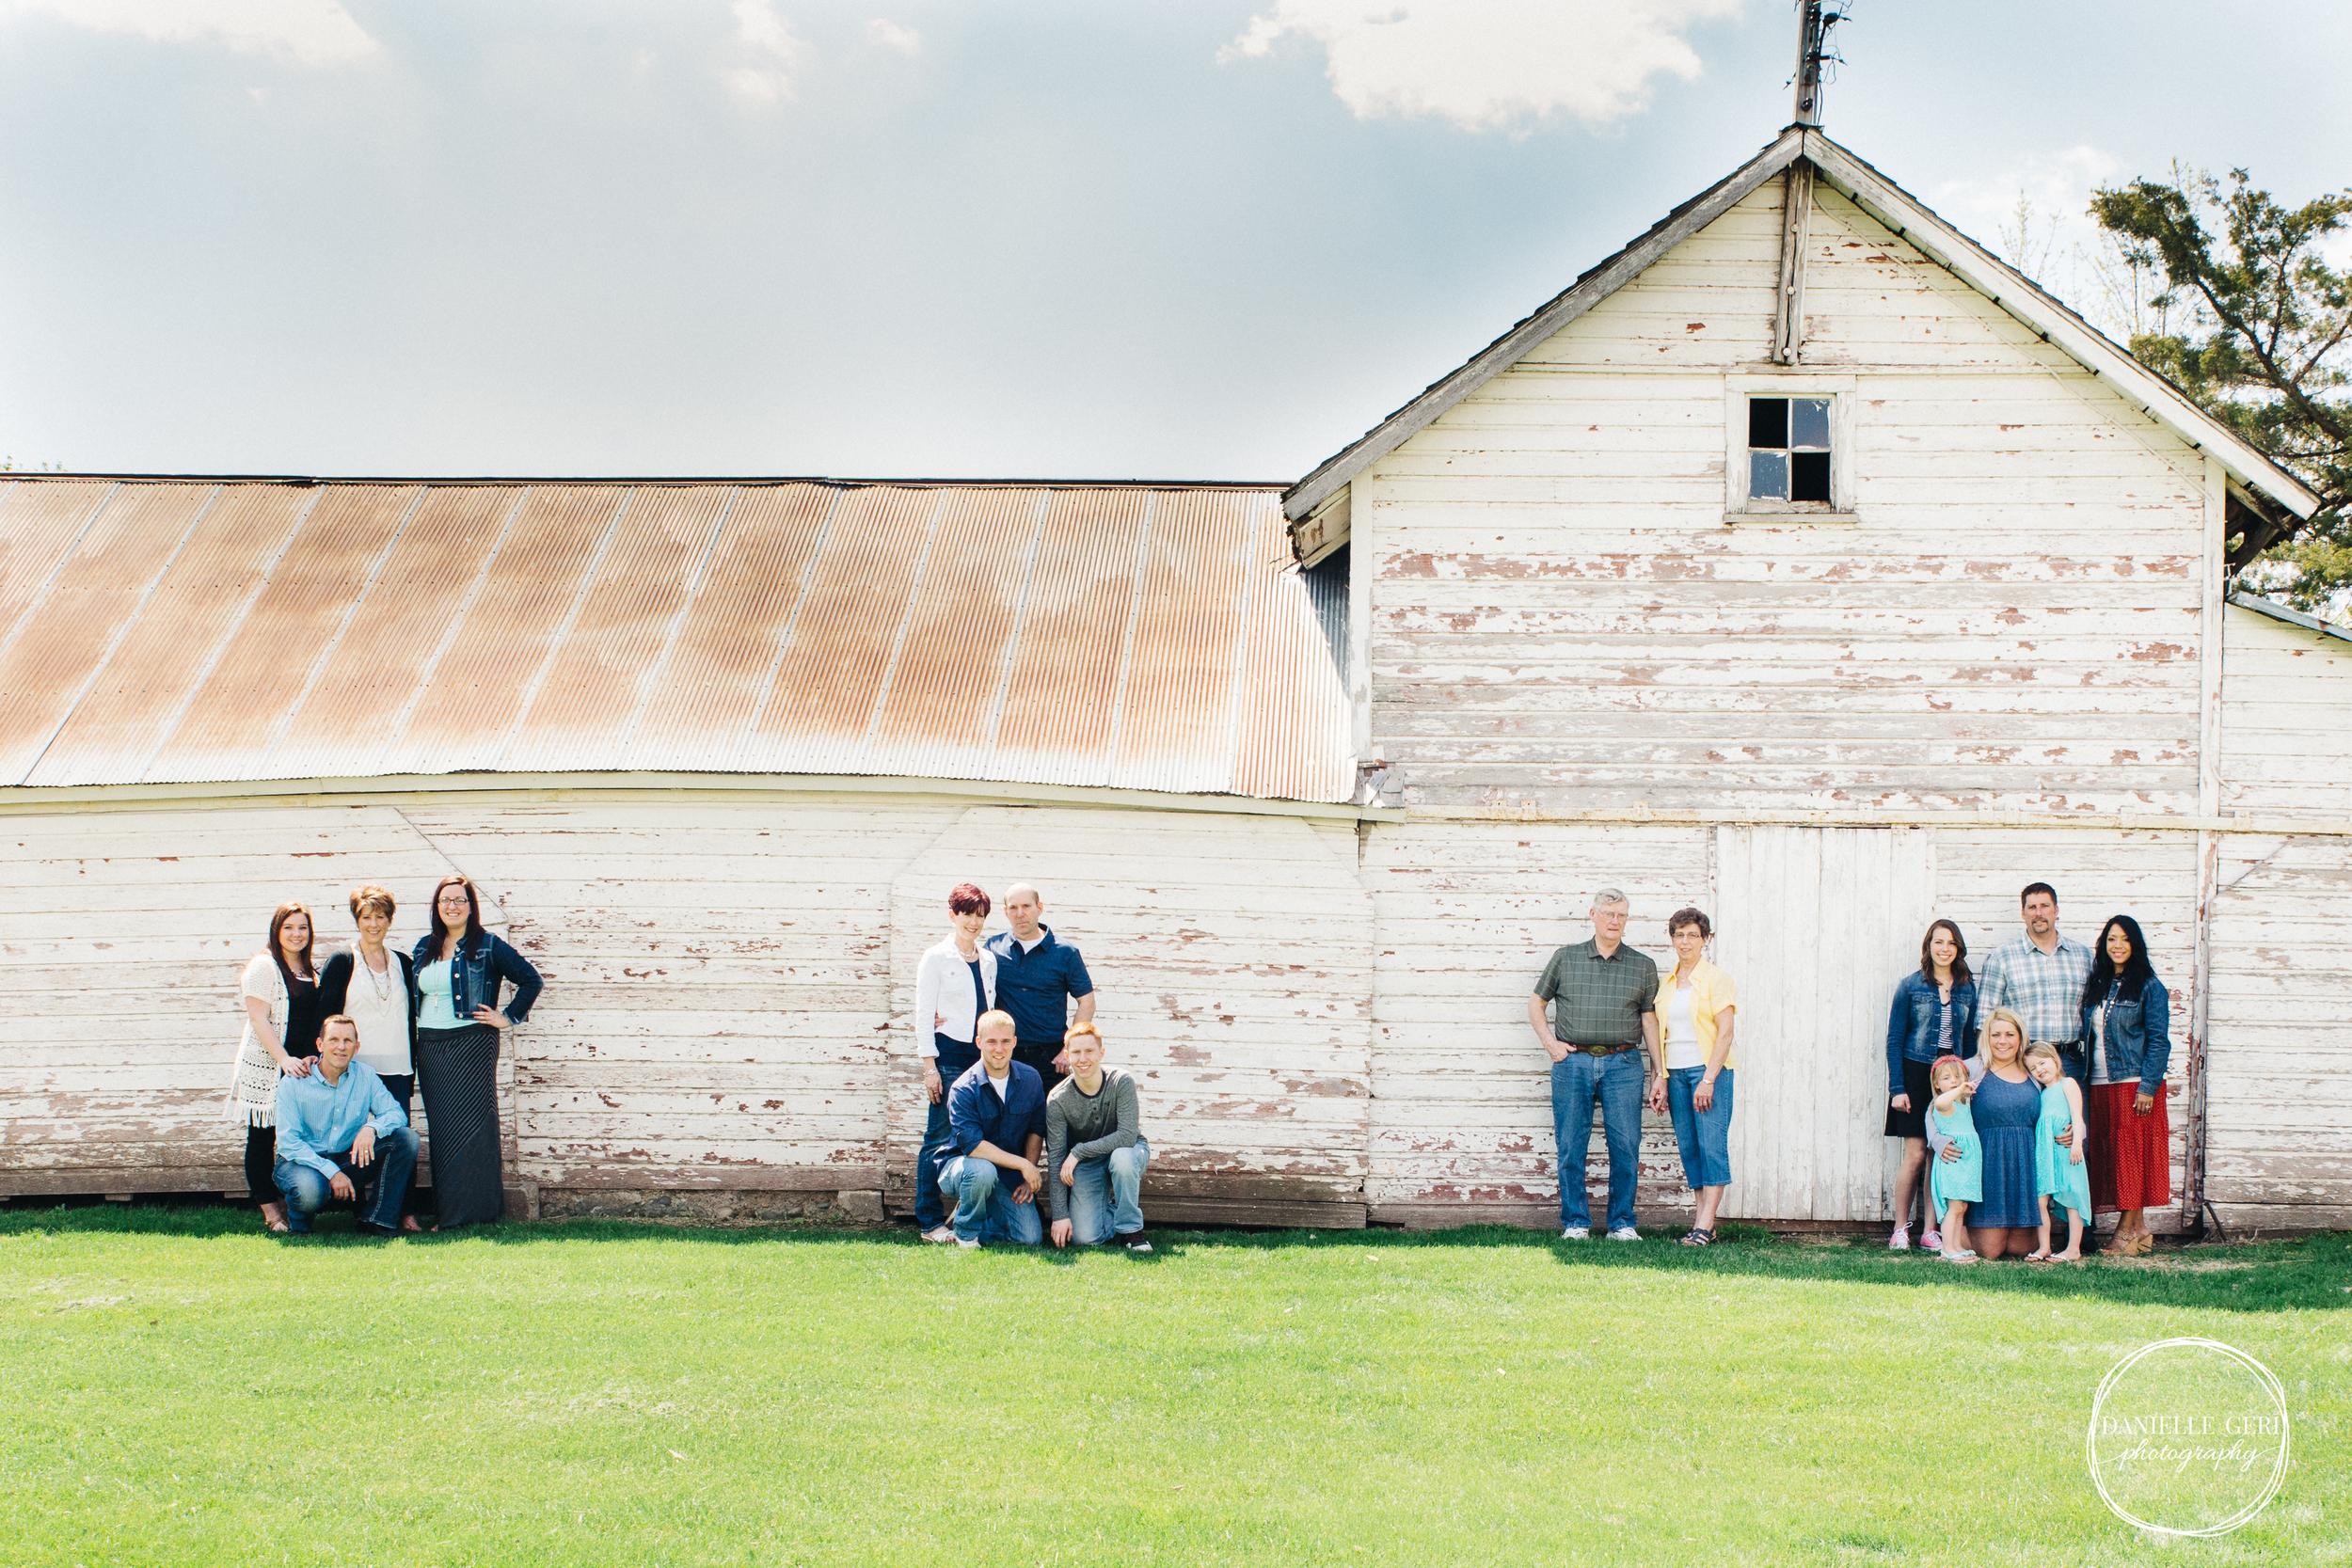 Minnesota Family Photography-21.jpg